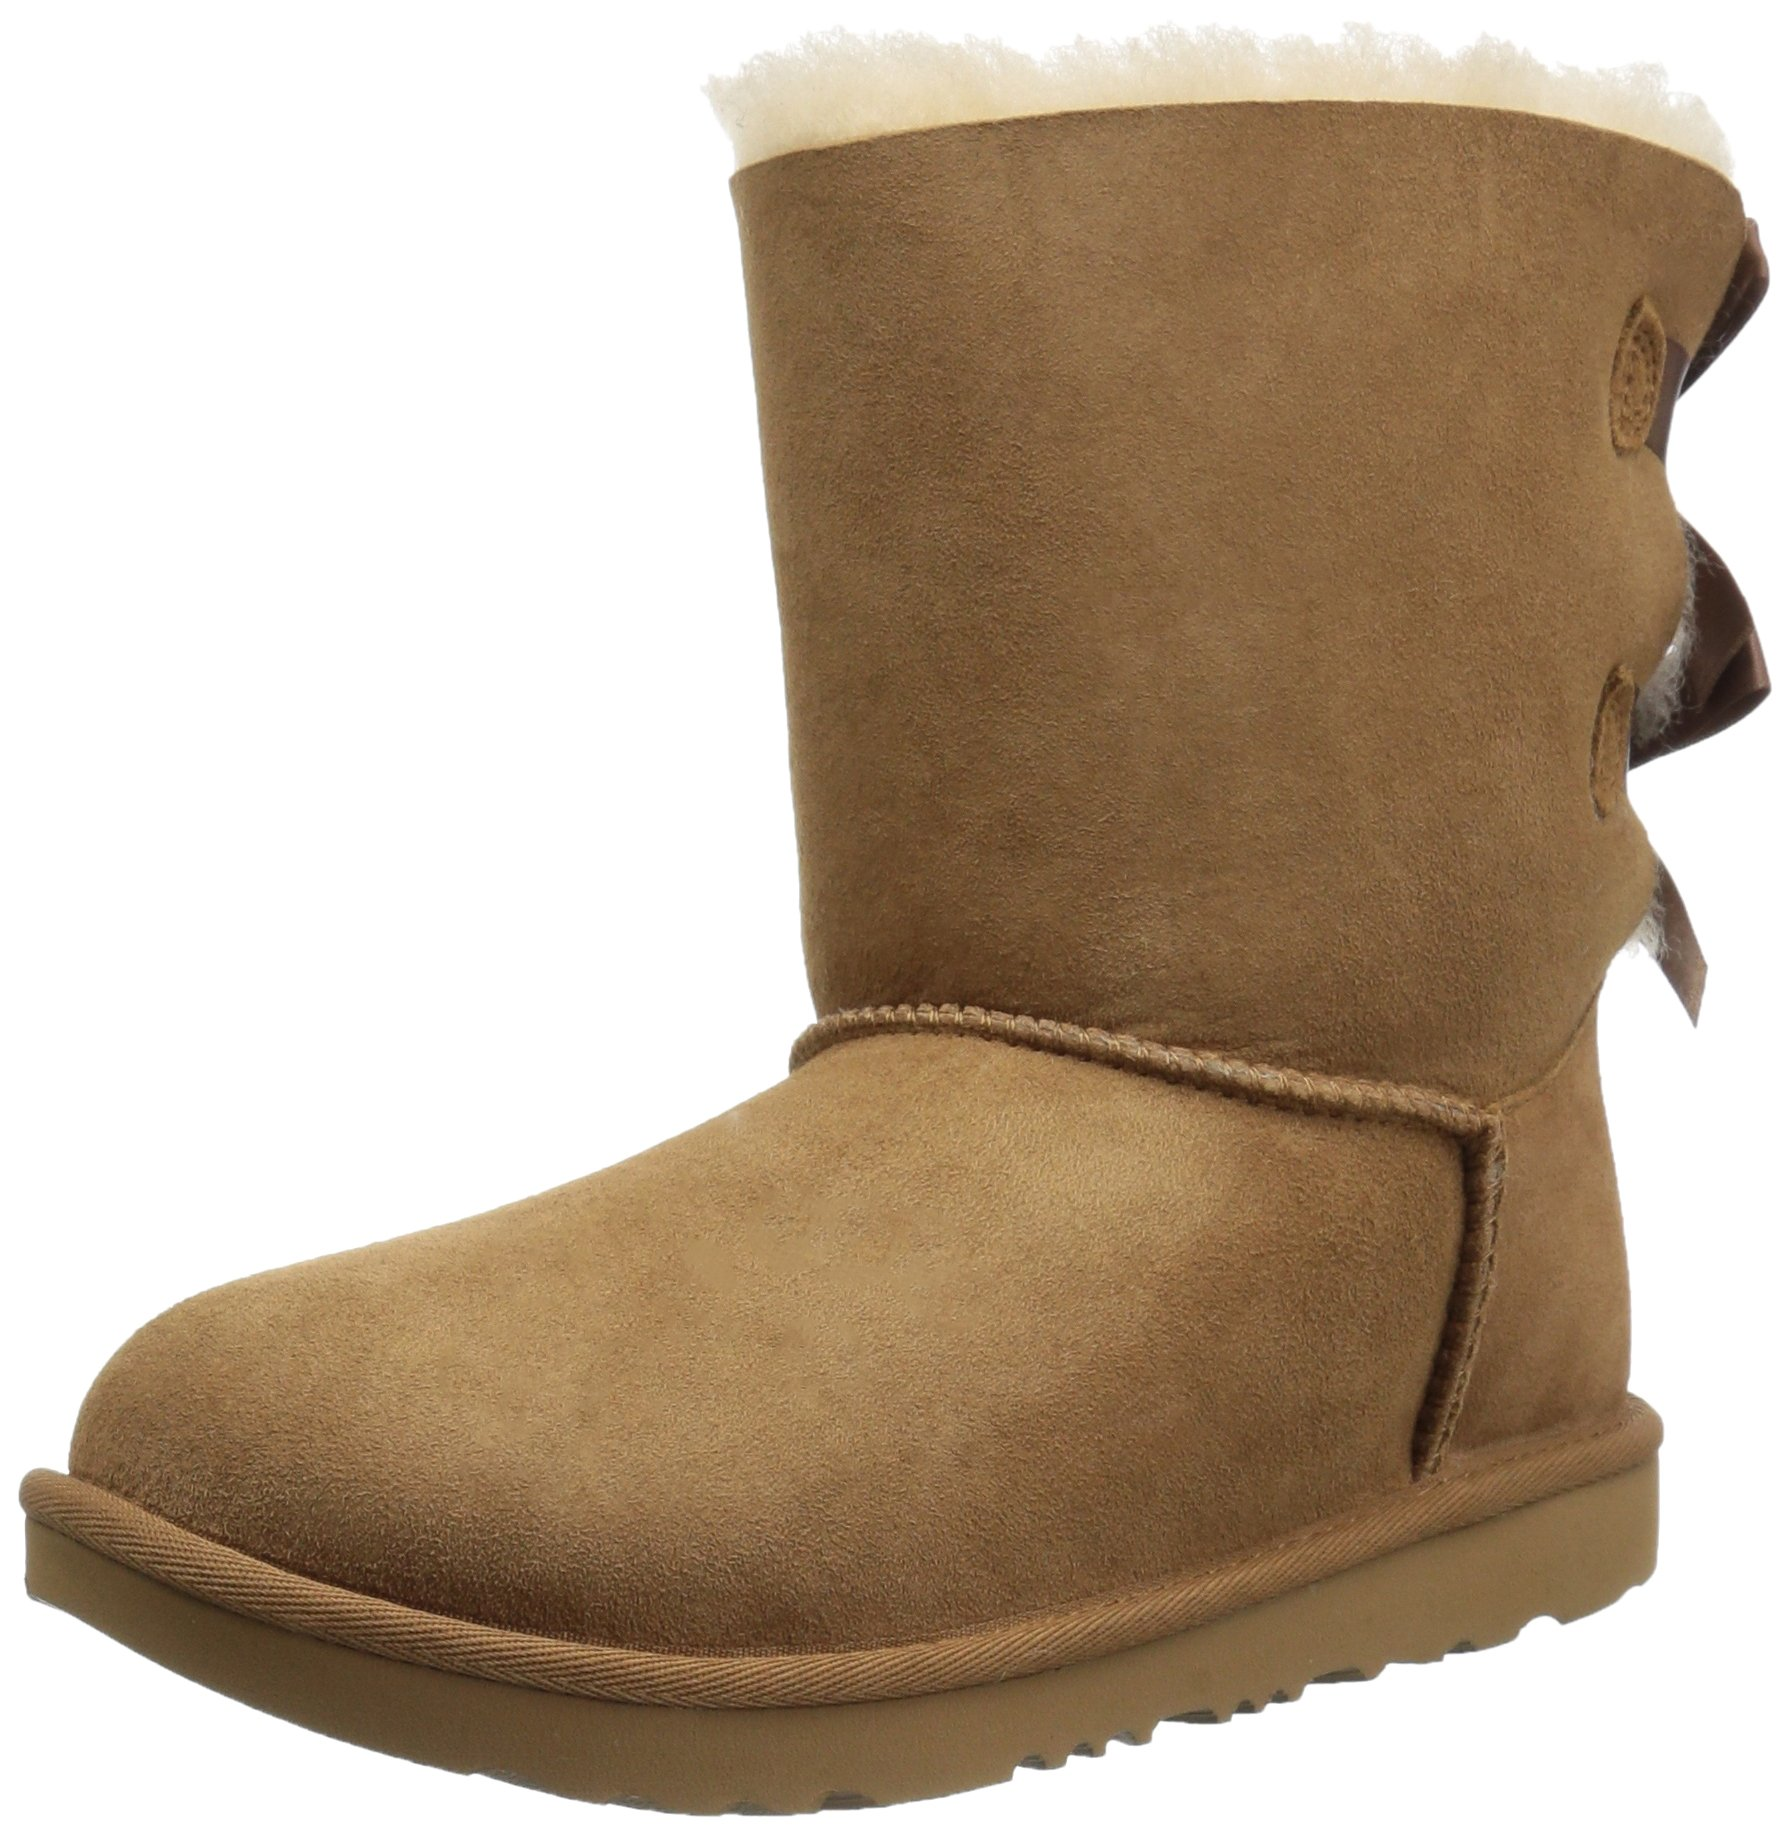 UGG Kids K Bailey Bow II Fashion Boot, Chestnut, 3 M US Little Kid